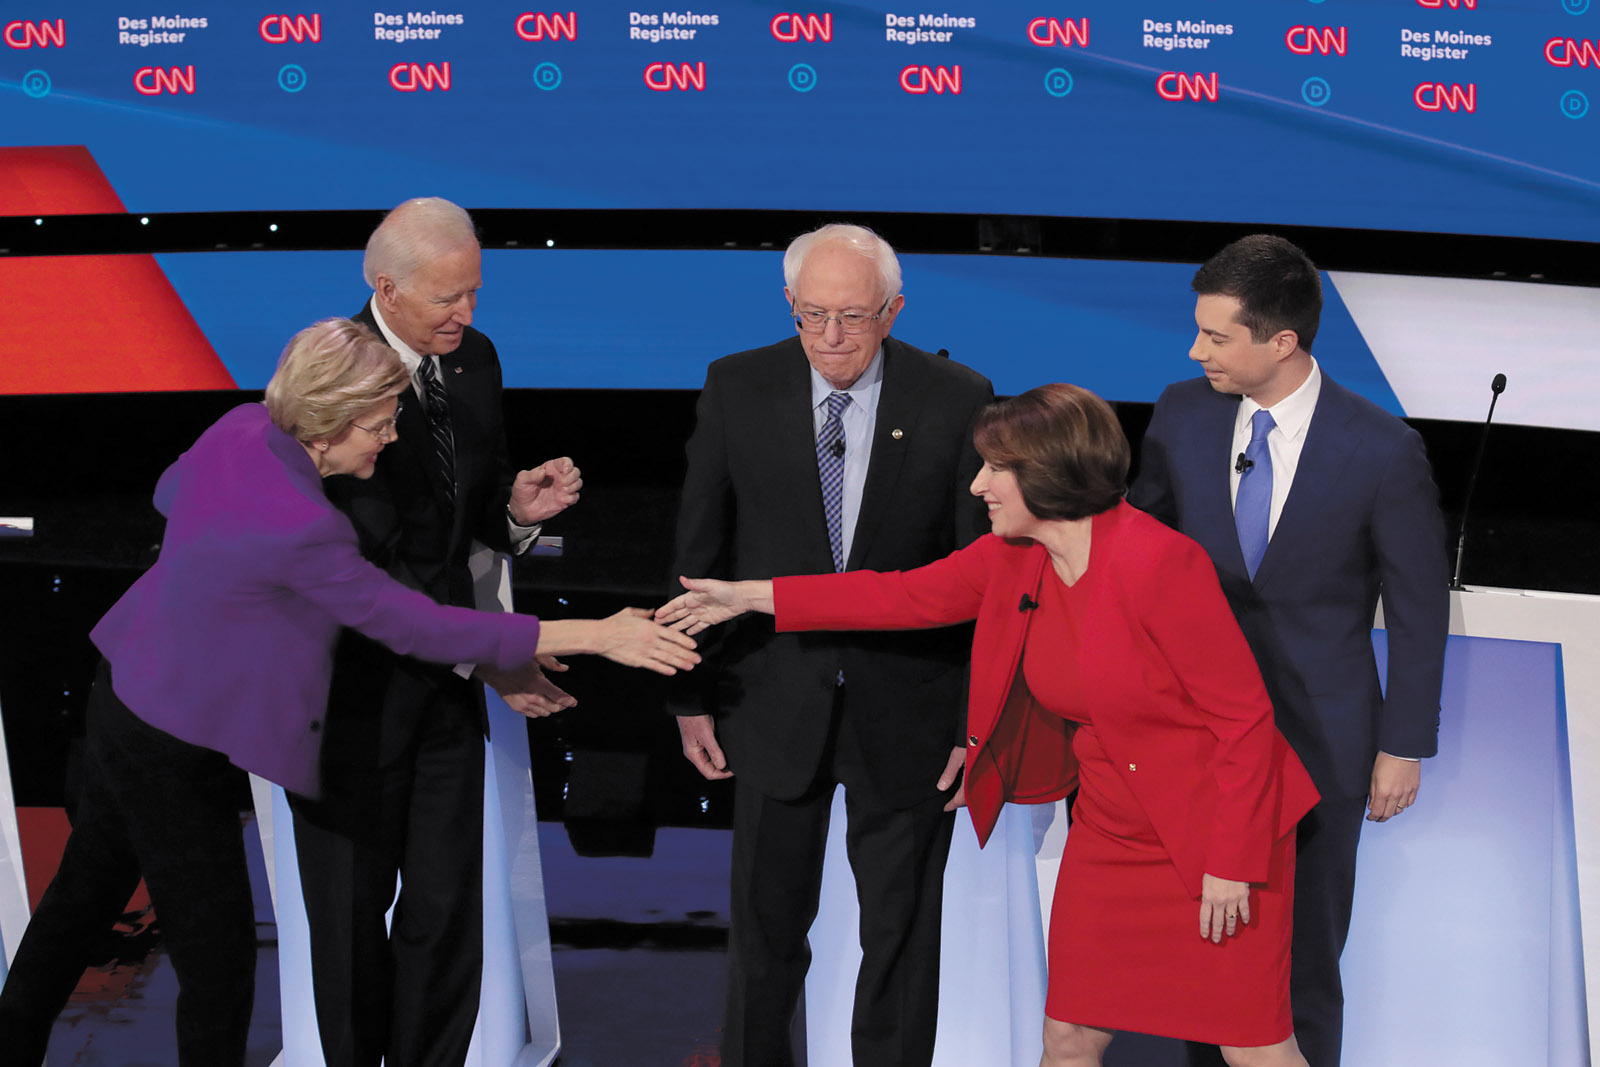 Elizabeth Warren, Joe Biden, Bernie Sanders, Amy Klobuchar, and Pete Buttigieg at the Democratic presidential debate in Des Moines, January 2020